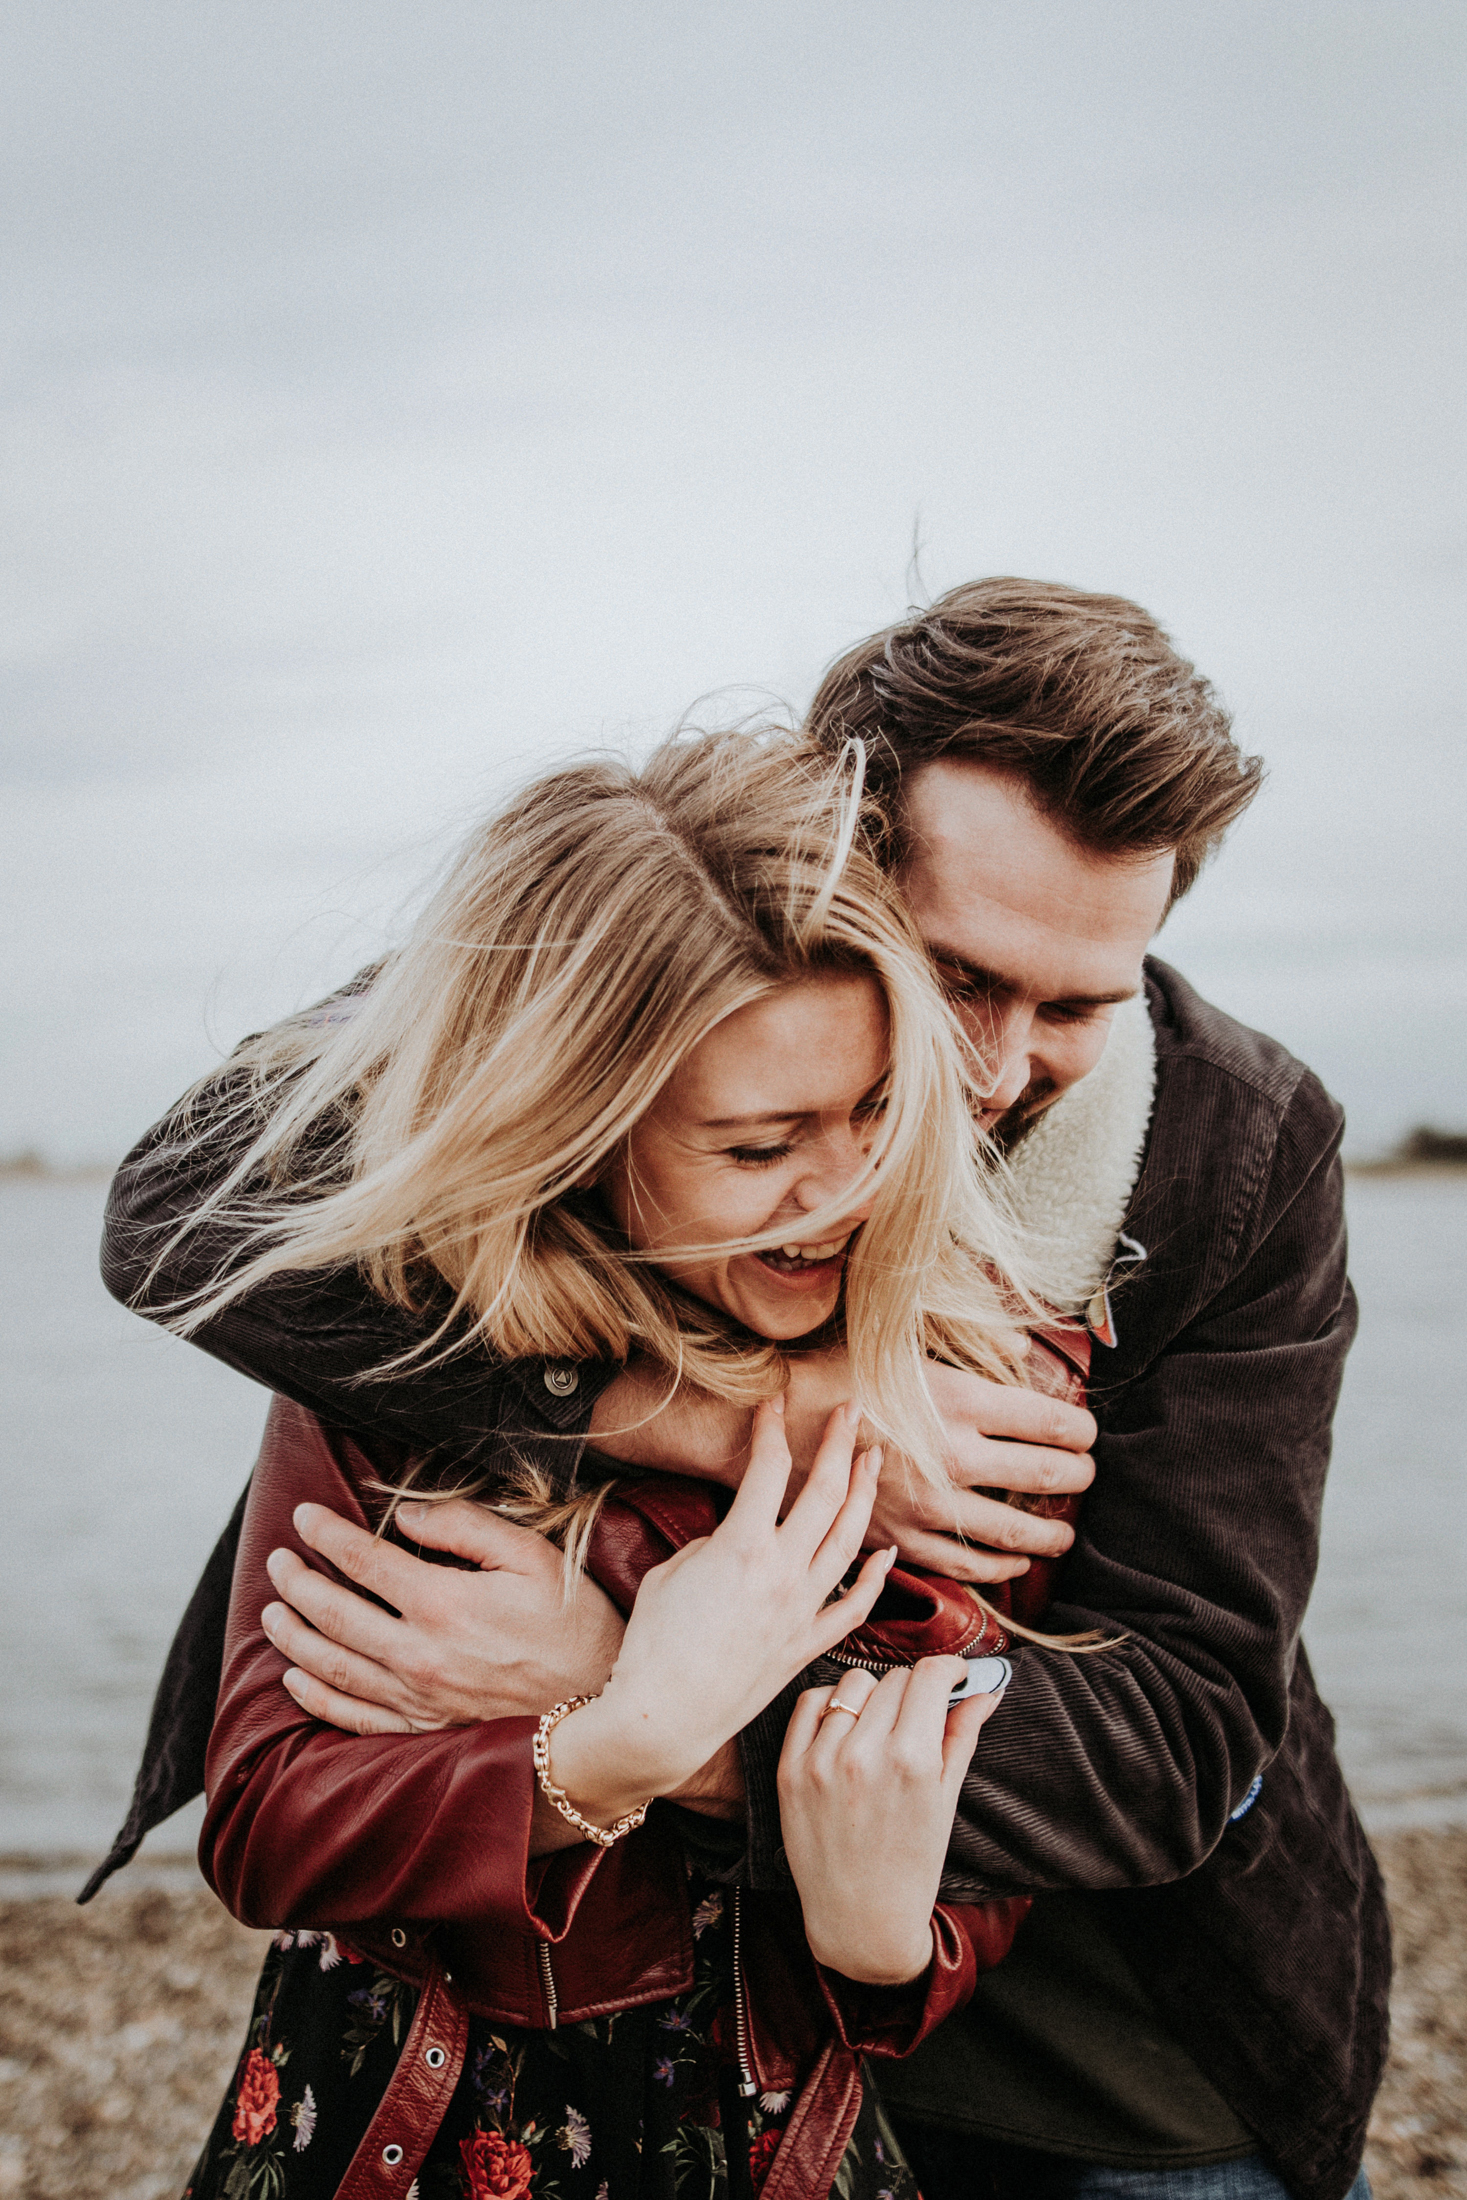 Wedding_Photographer_Mallorca_DanielaMarquardt_Photography_CanaryIslands_Lanzarote_Iceland_Tuscany_Santorini_Portugal_NewYork_Spain_Elopement_Hochzeitsfotograf_CK100